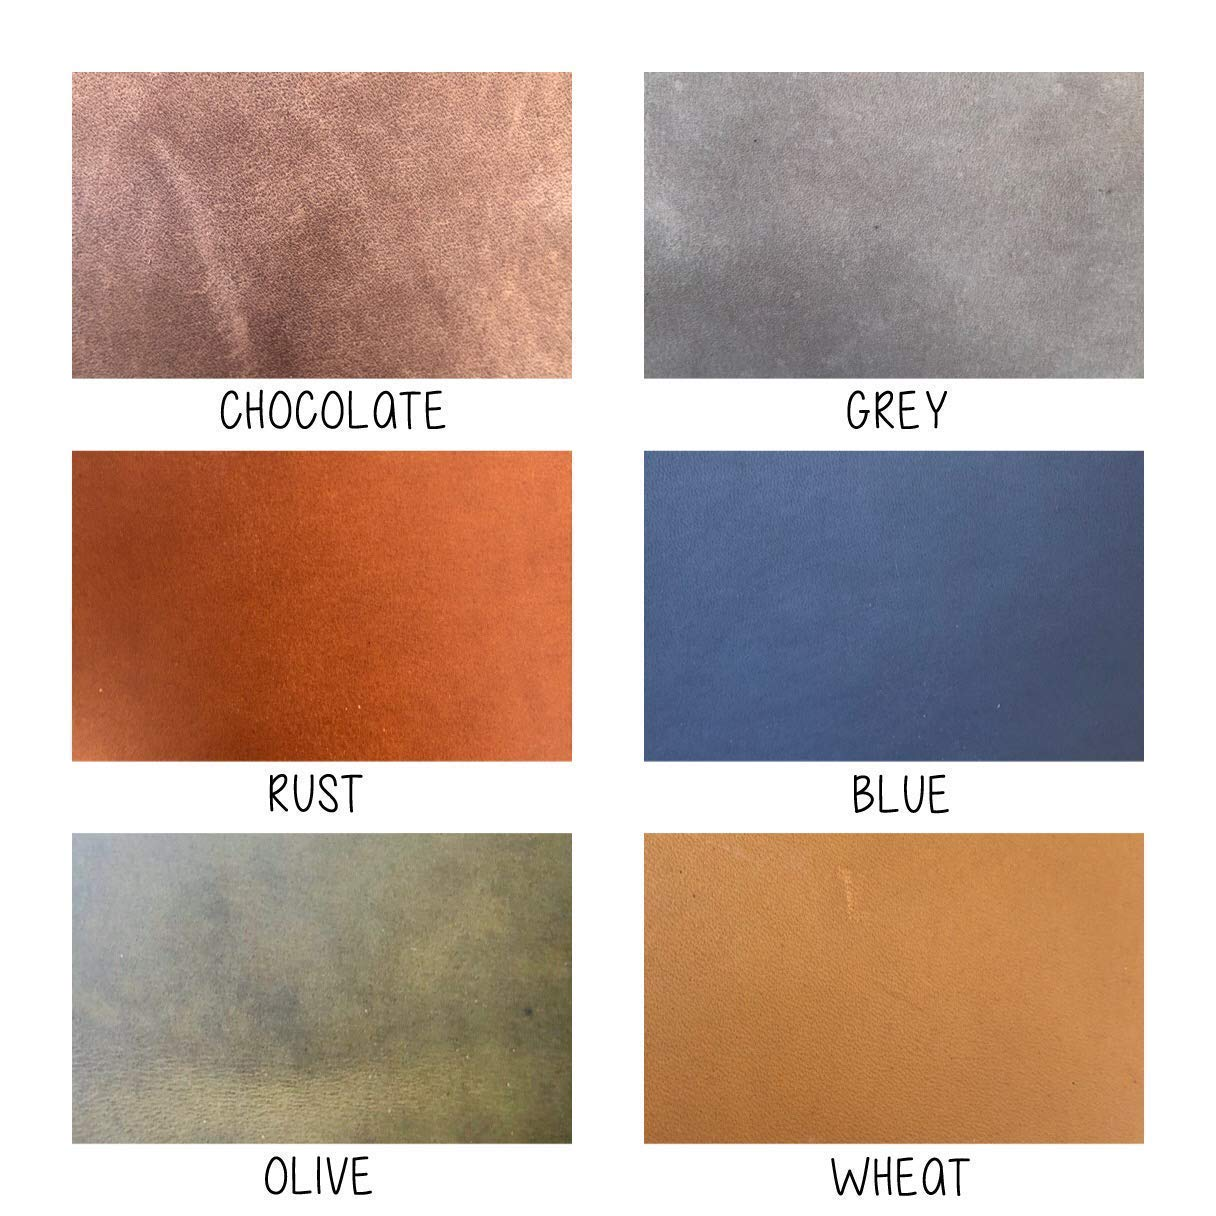 b5c312f3142e Amazon.com  Personalized Leather Valet Tray